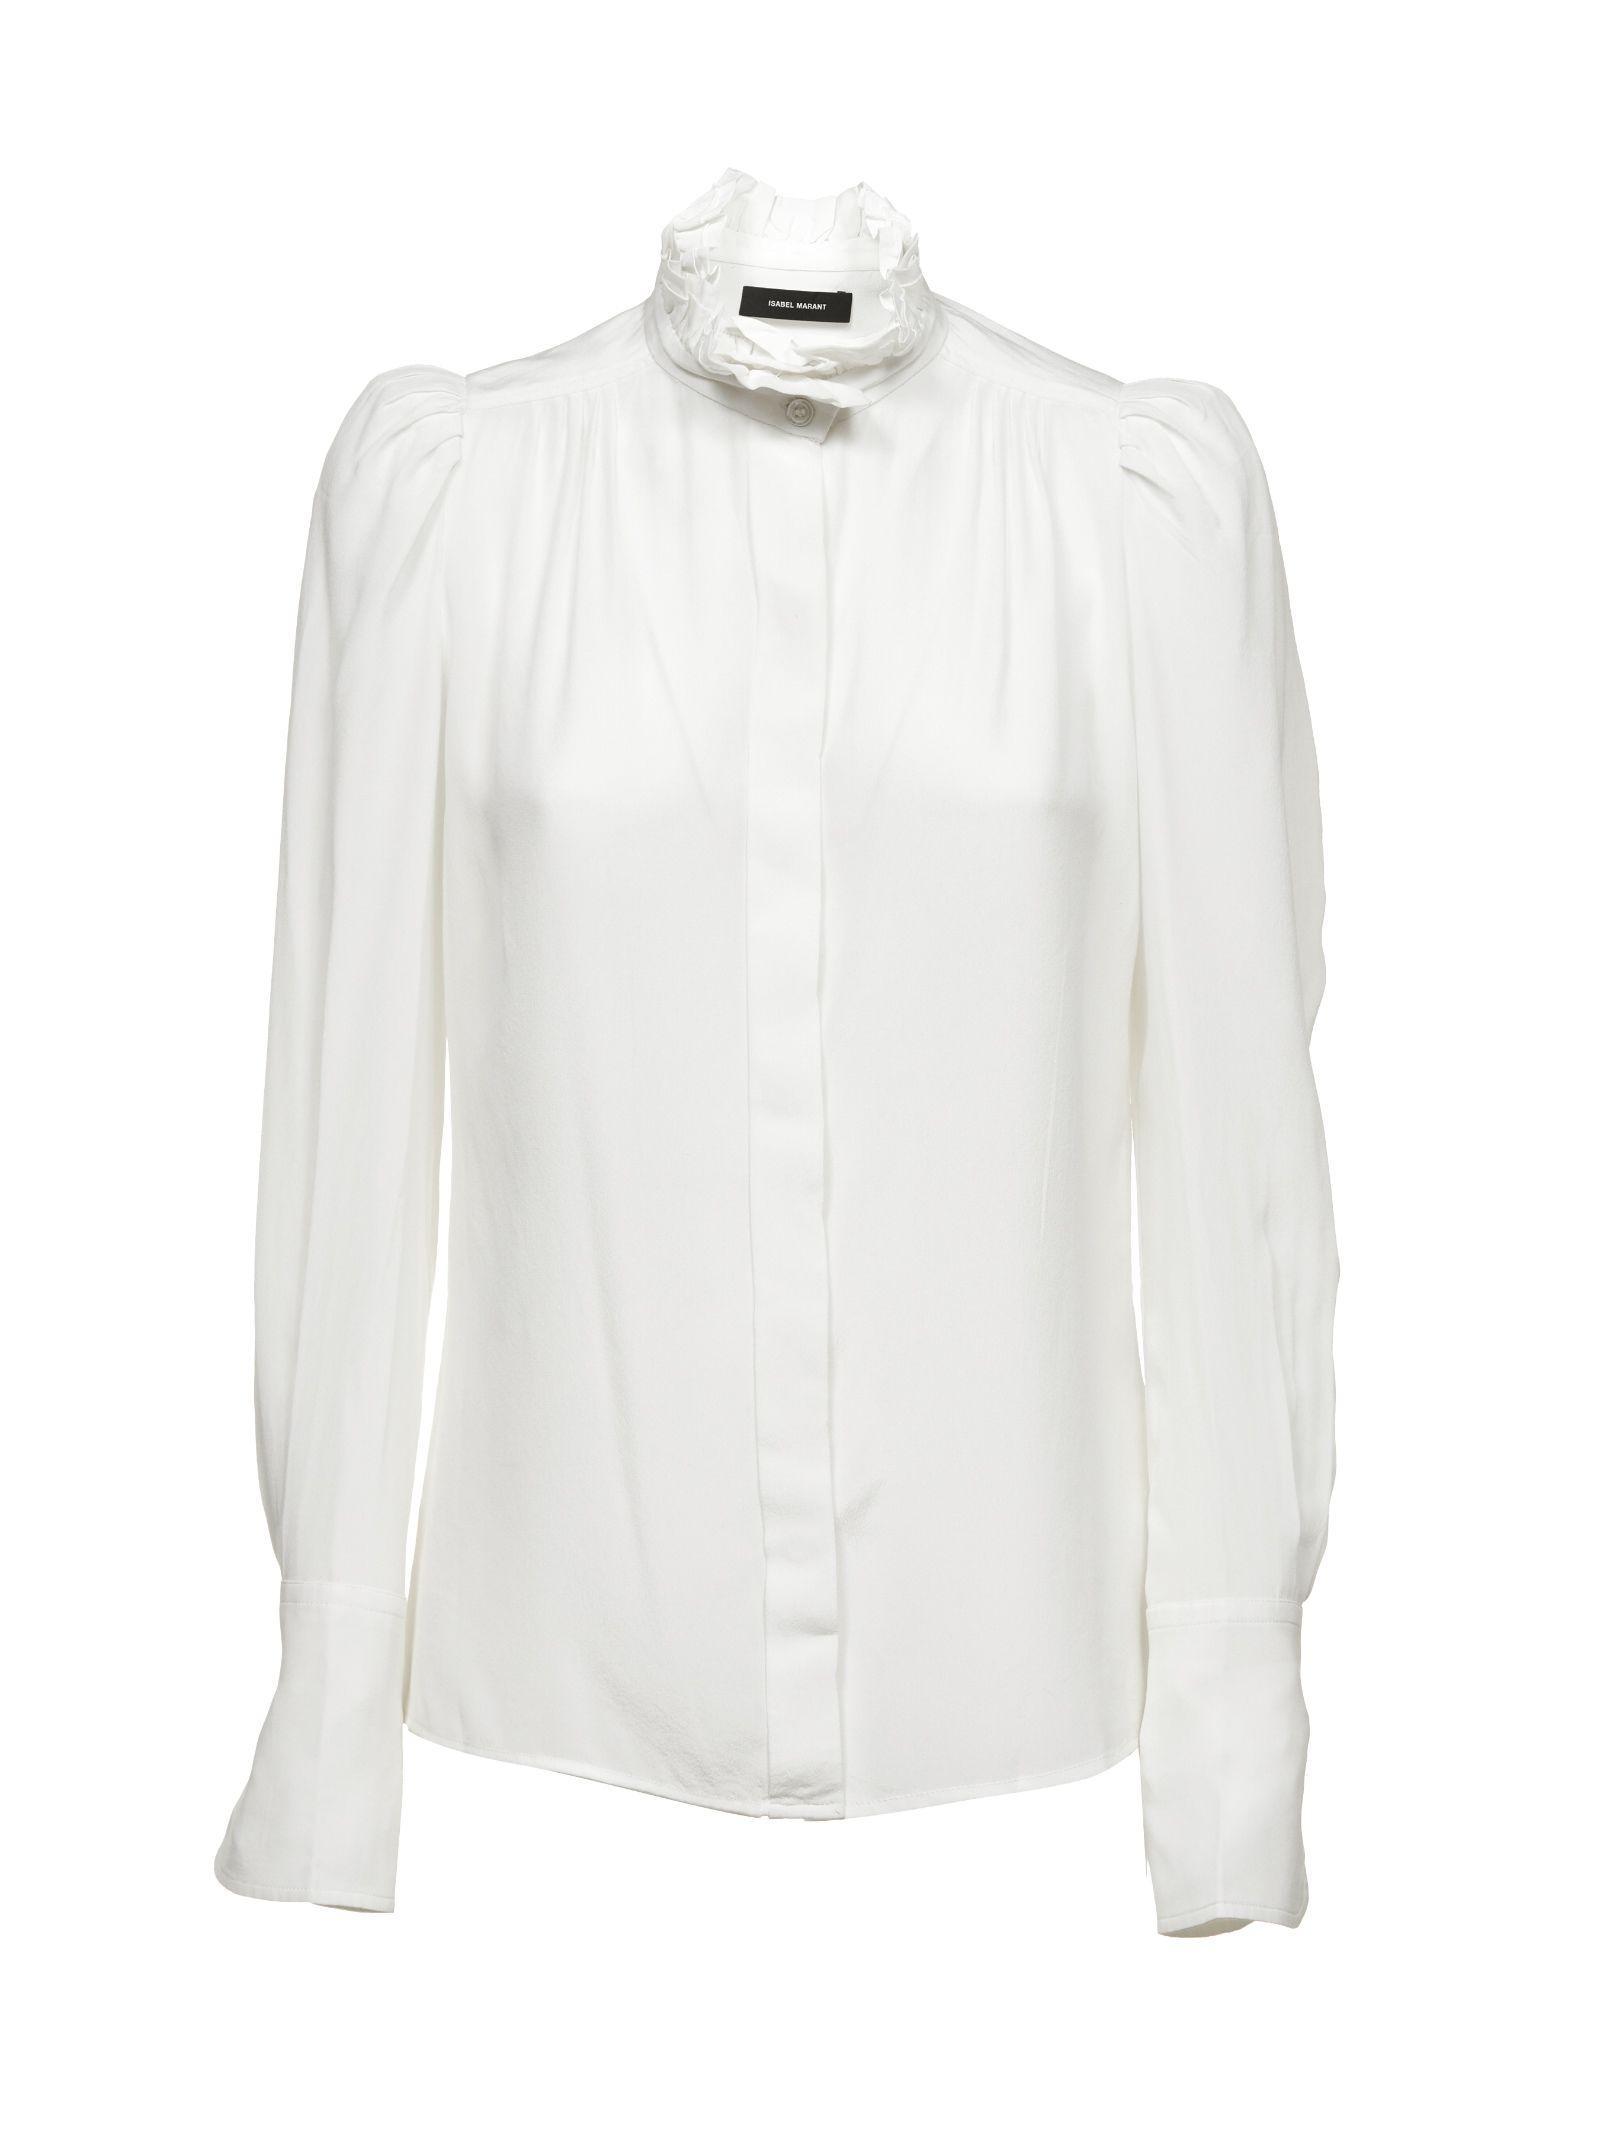 51bf769d8c776 Isabel Marant Lamia Shirt In Ecru